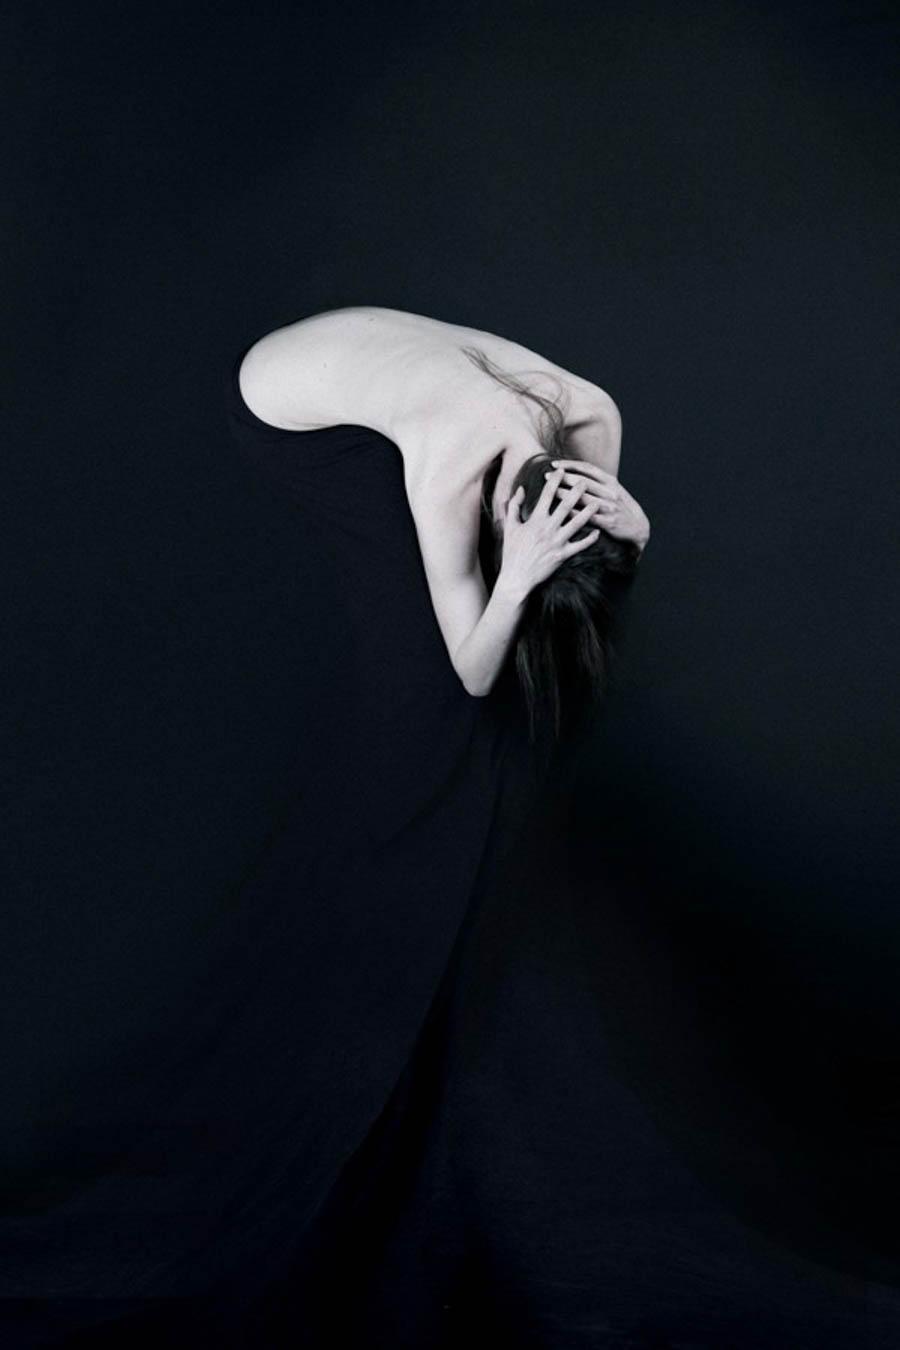 Behind Anxiety by Thibault Delhom